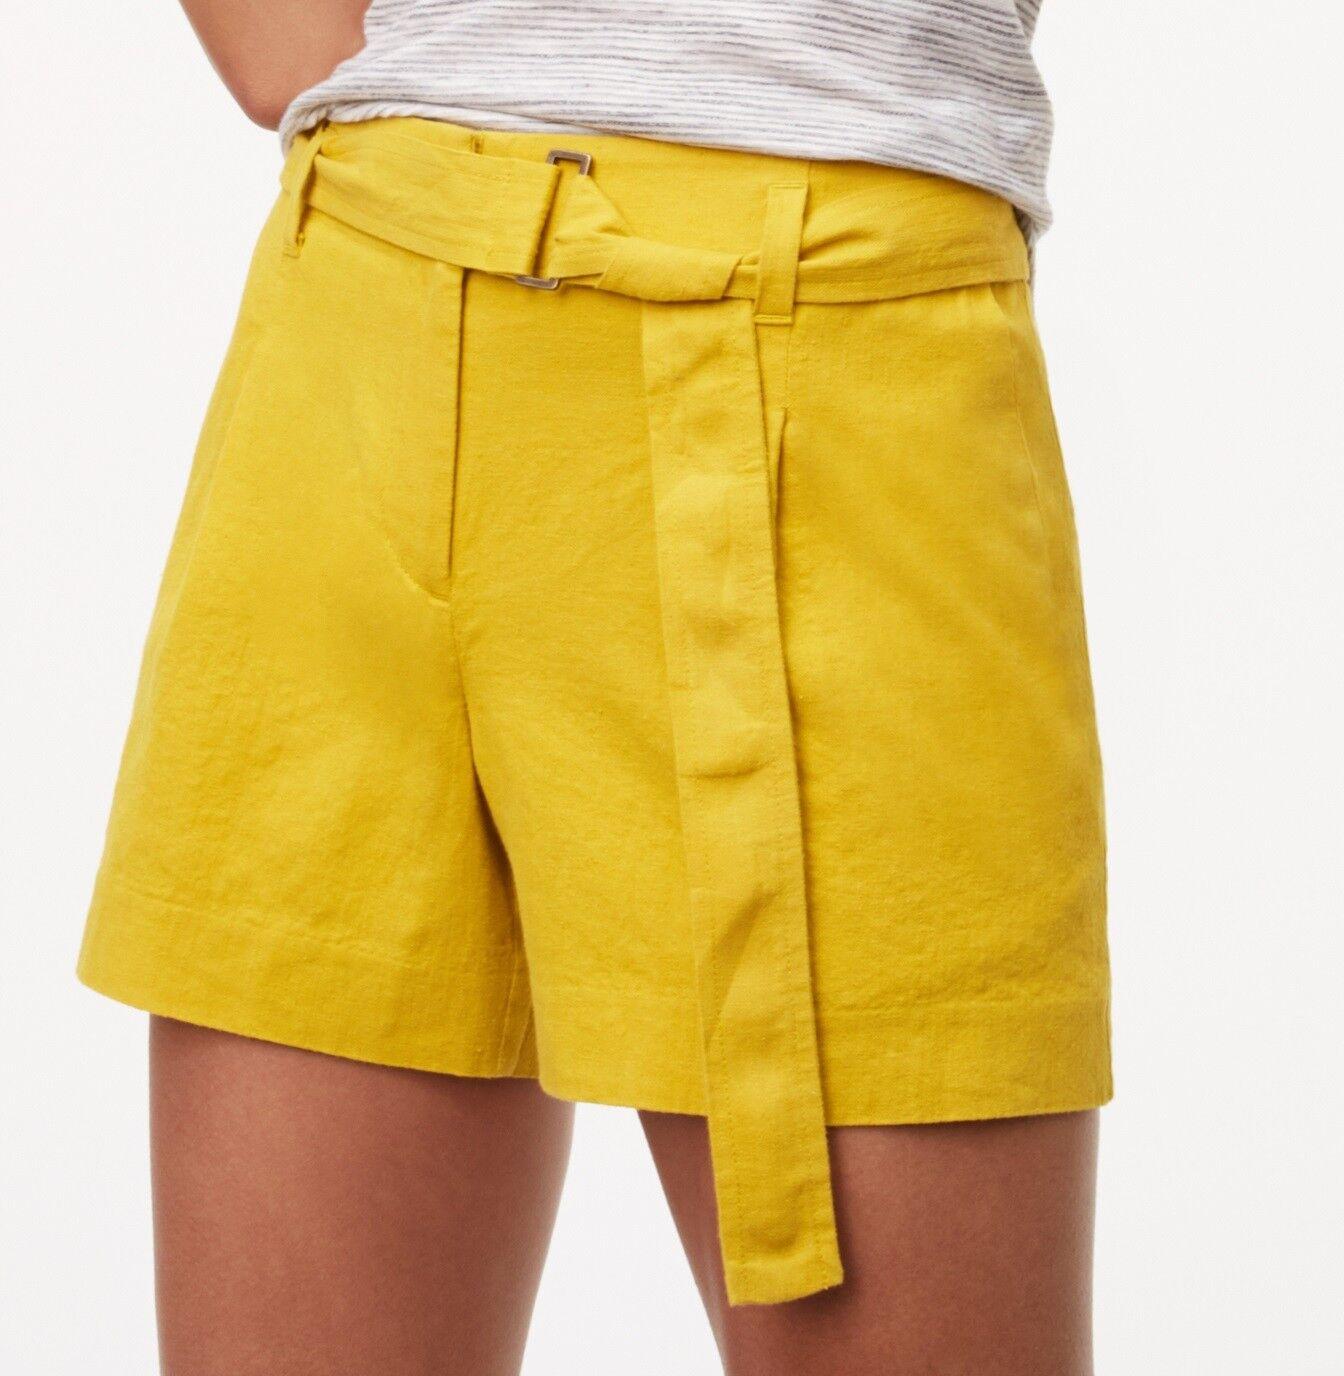 NWT Ann Taylor LOFT Linen Cotton Belted Shorts Size 8